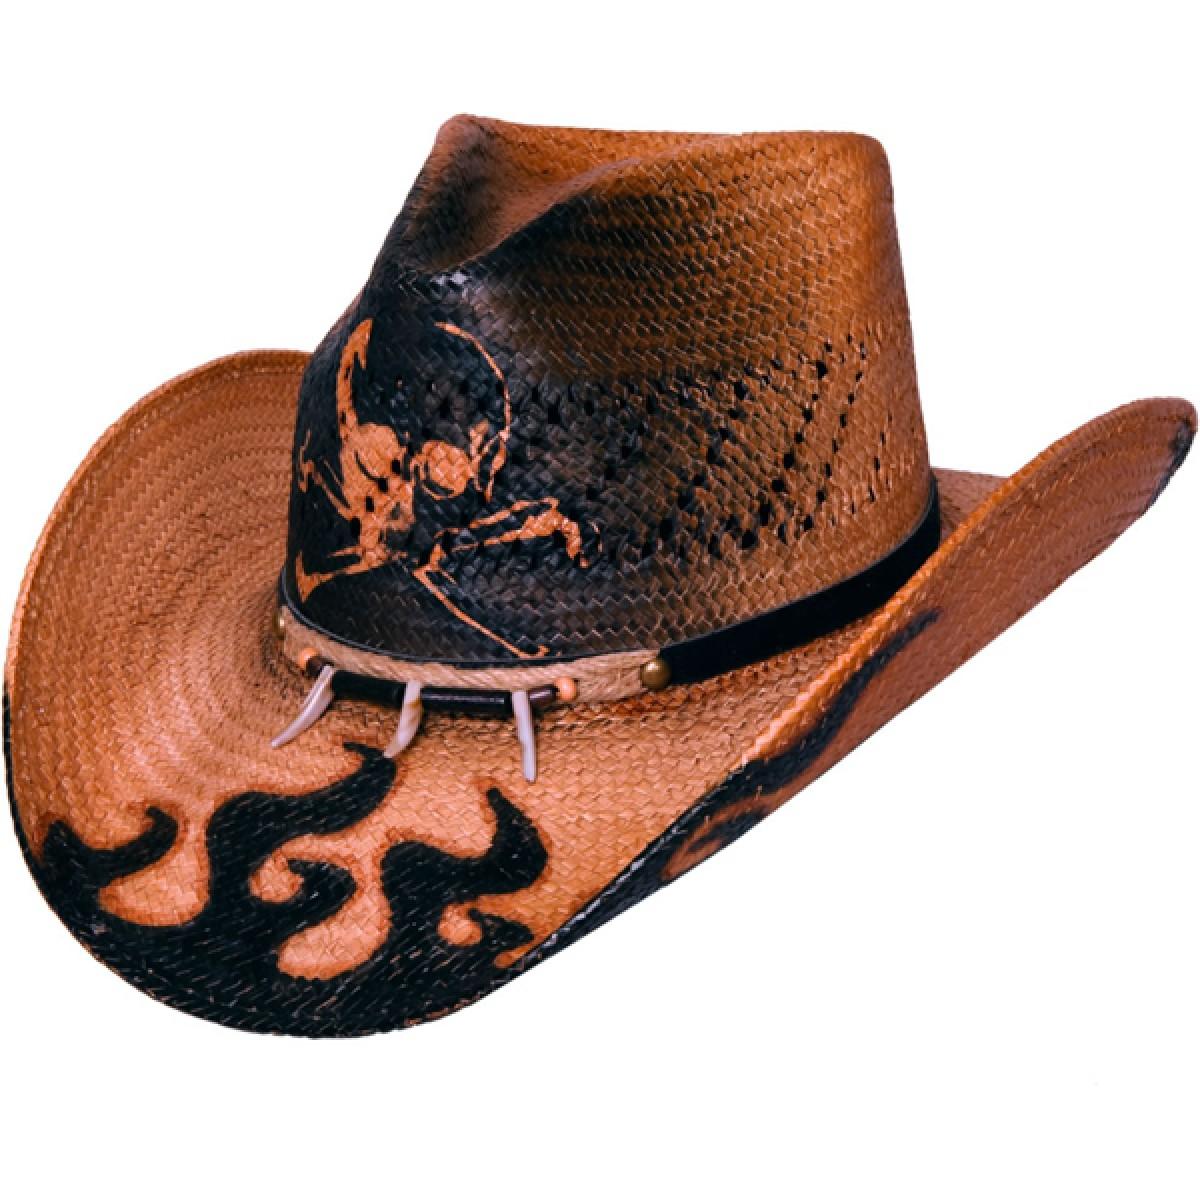 cowboy hats bullhide dangerous - straw cowboy hat DJCHWEQ